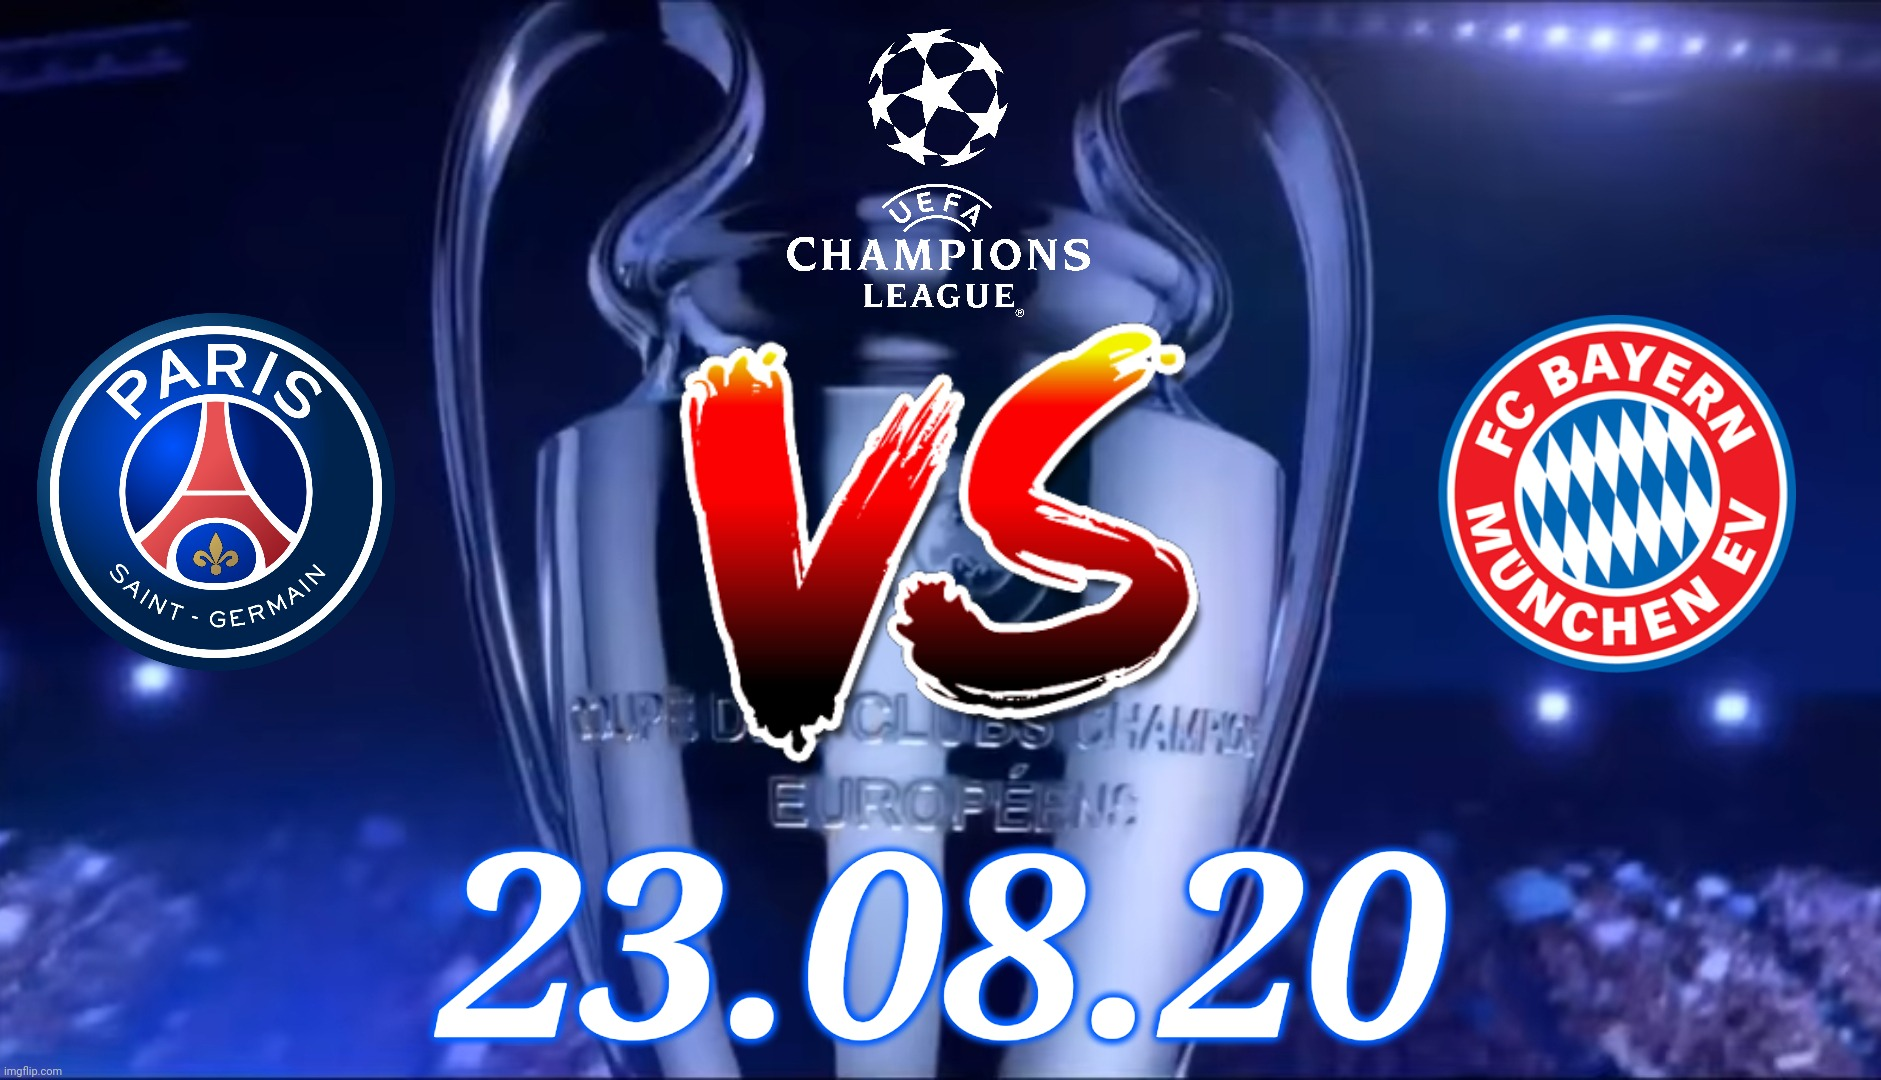 Uefa Champions League Final Lisbon 2020 Paris Saint Germain Vs Fc Bayern Munchen Imgflip